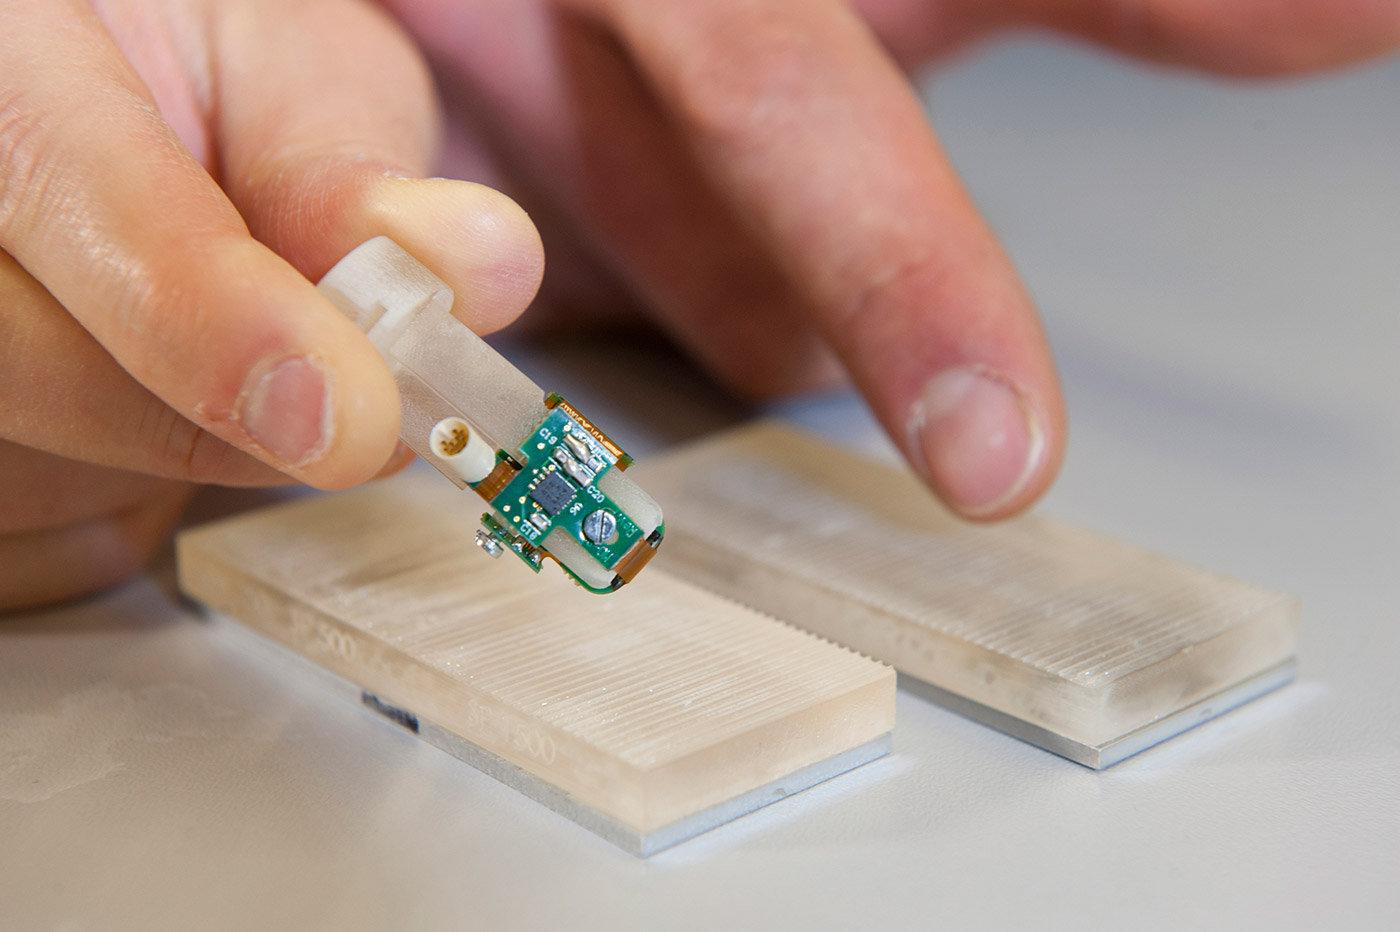 bionic-fingertip-lede